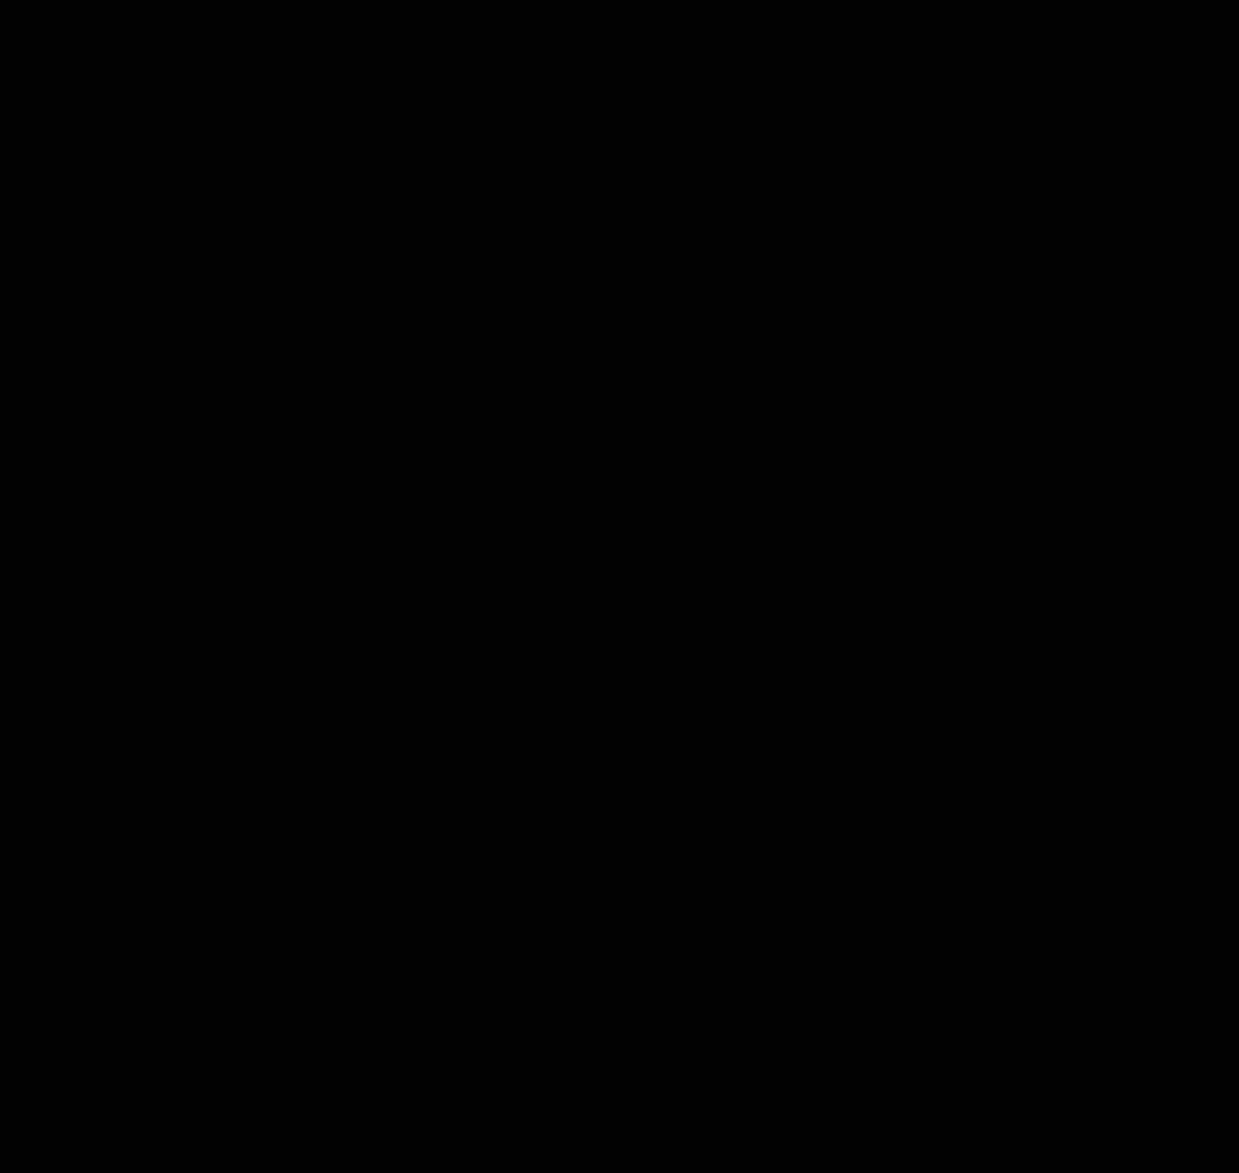 yk9727